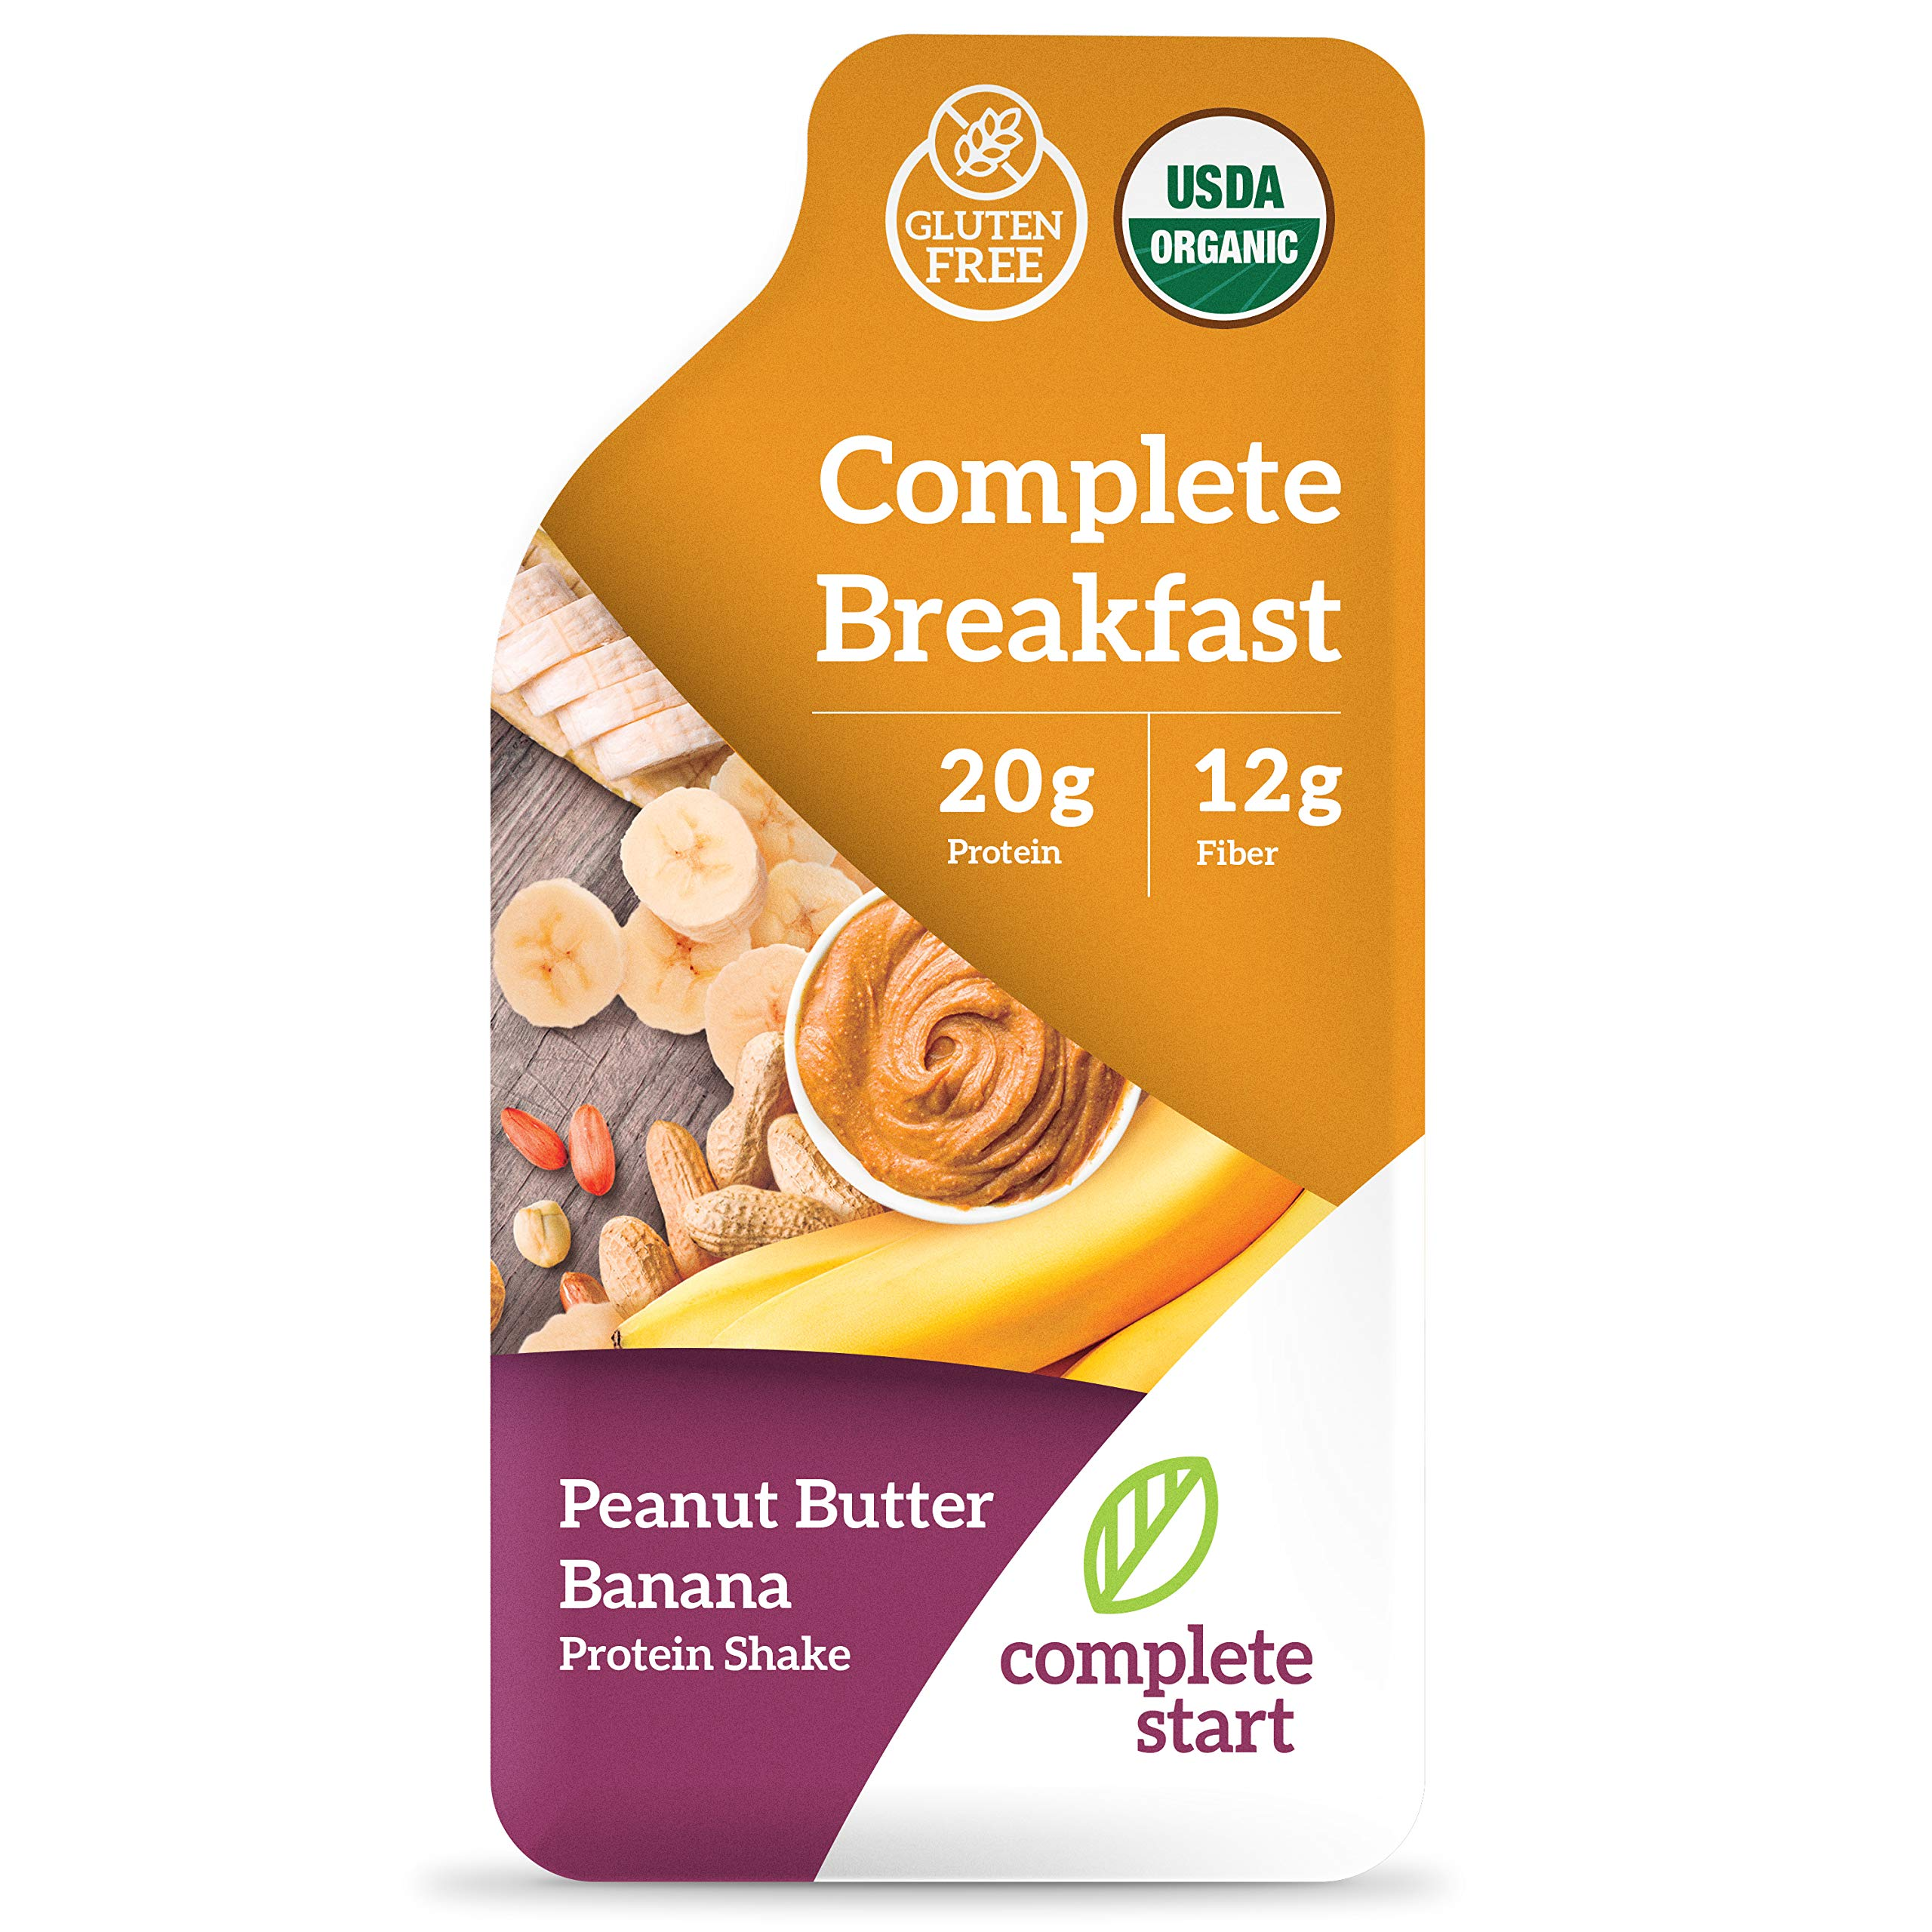 Complete Start Replacement Organic Breakfast